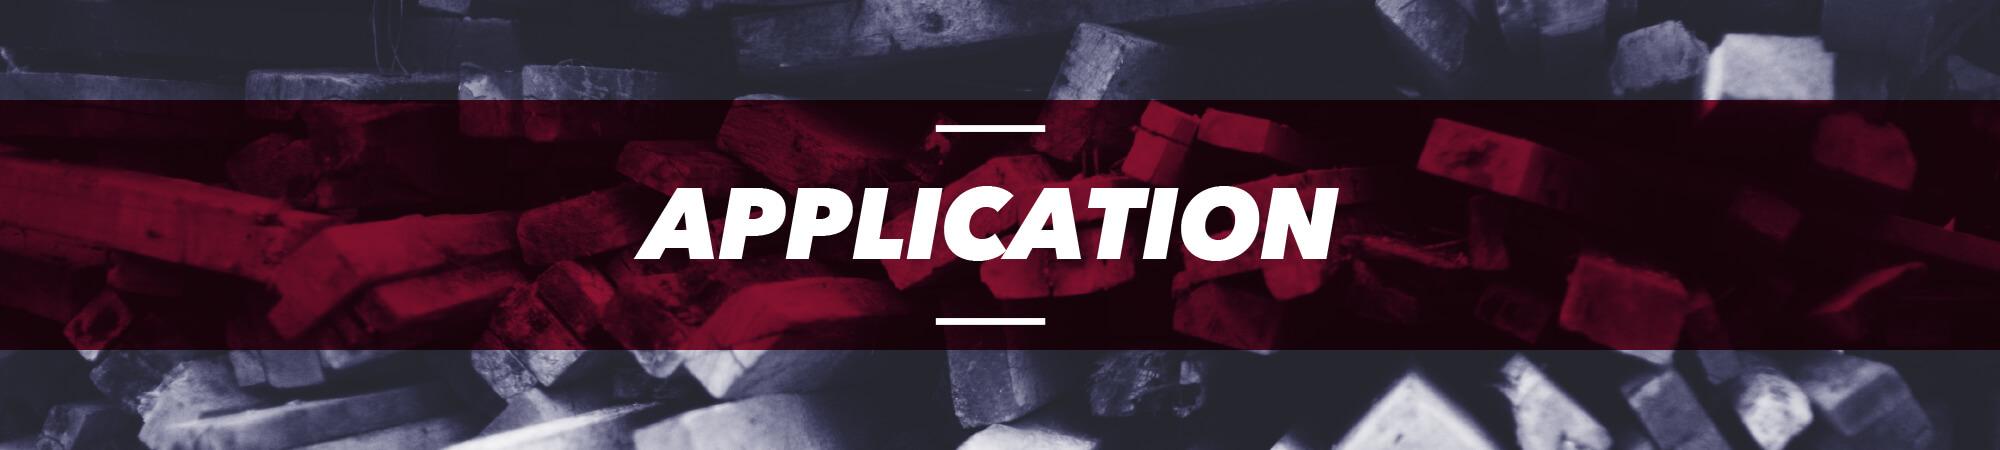 YWAM Worcester Application